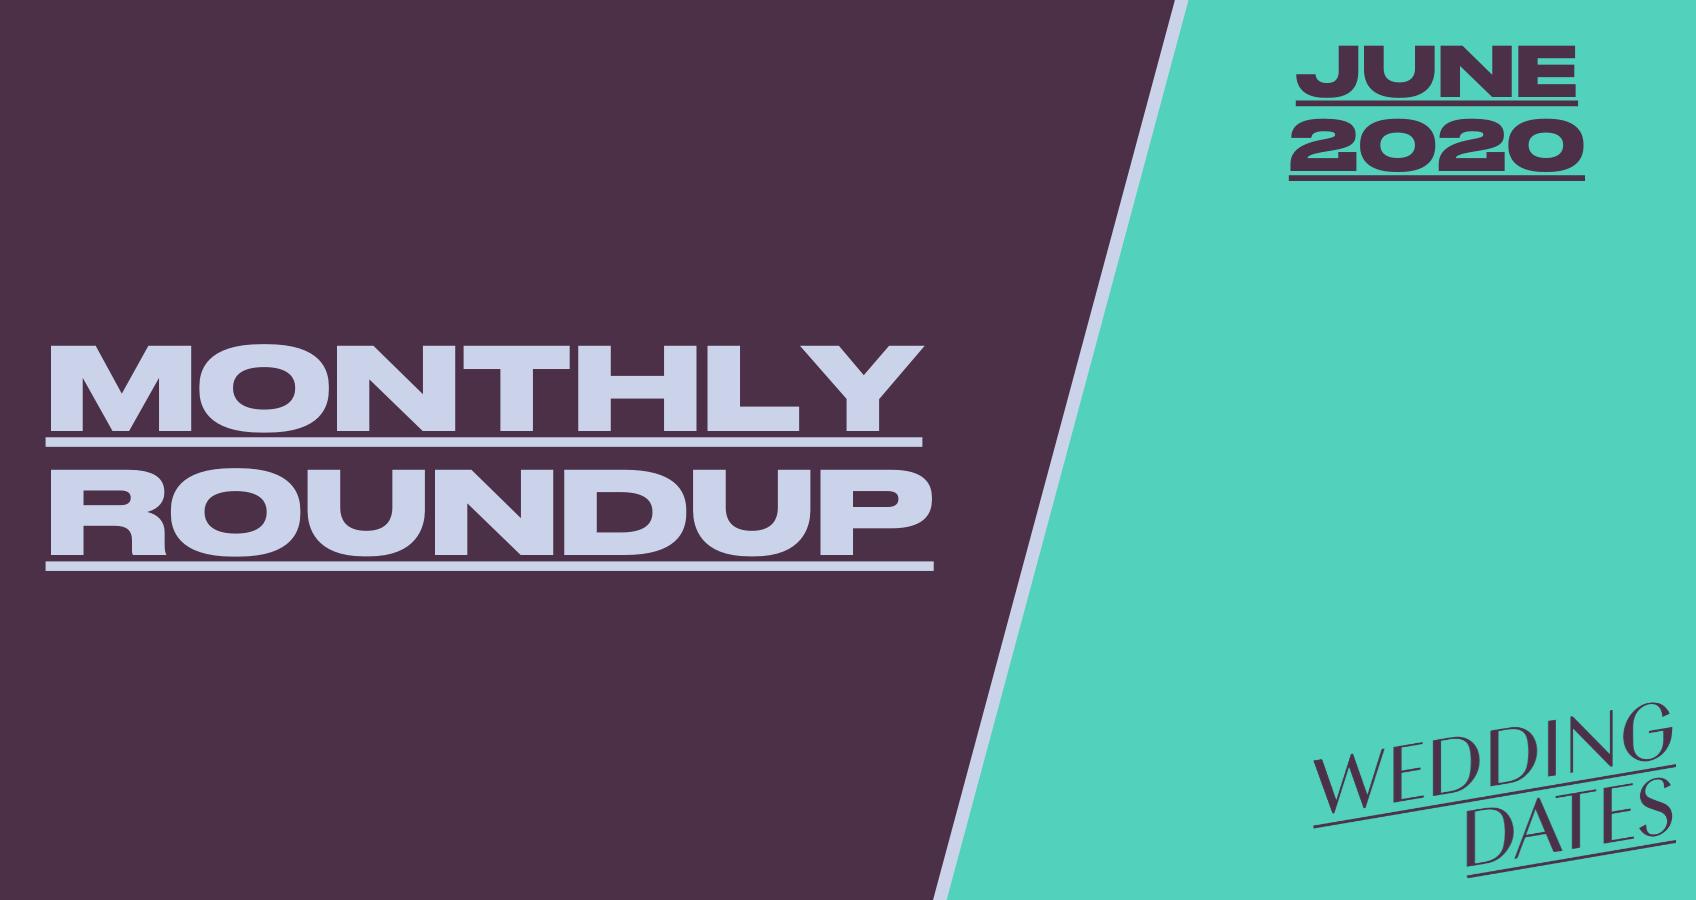 COVID-19 June 2020 Roundup